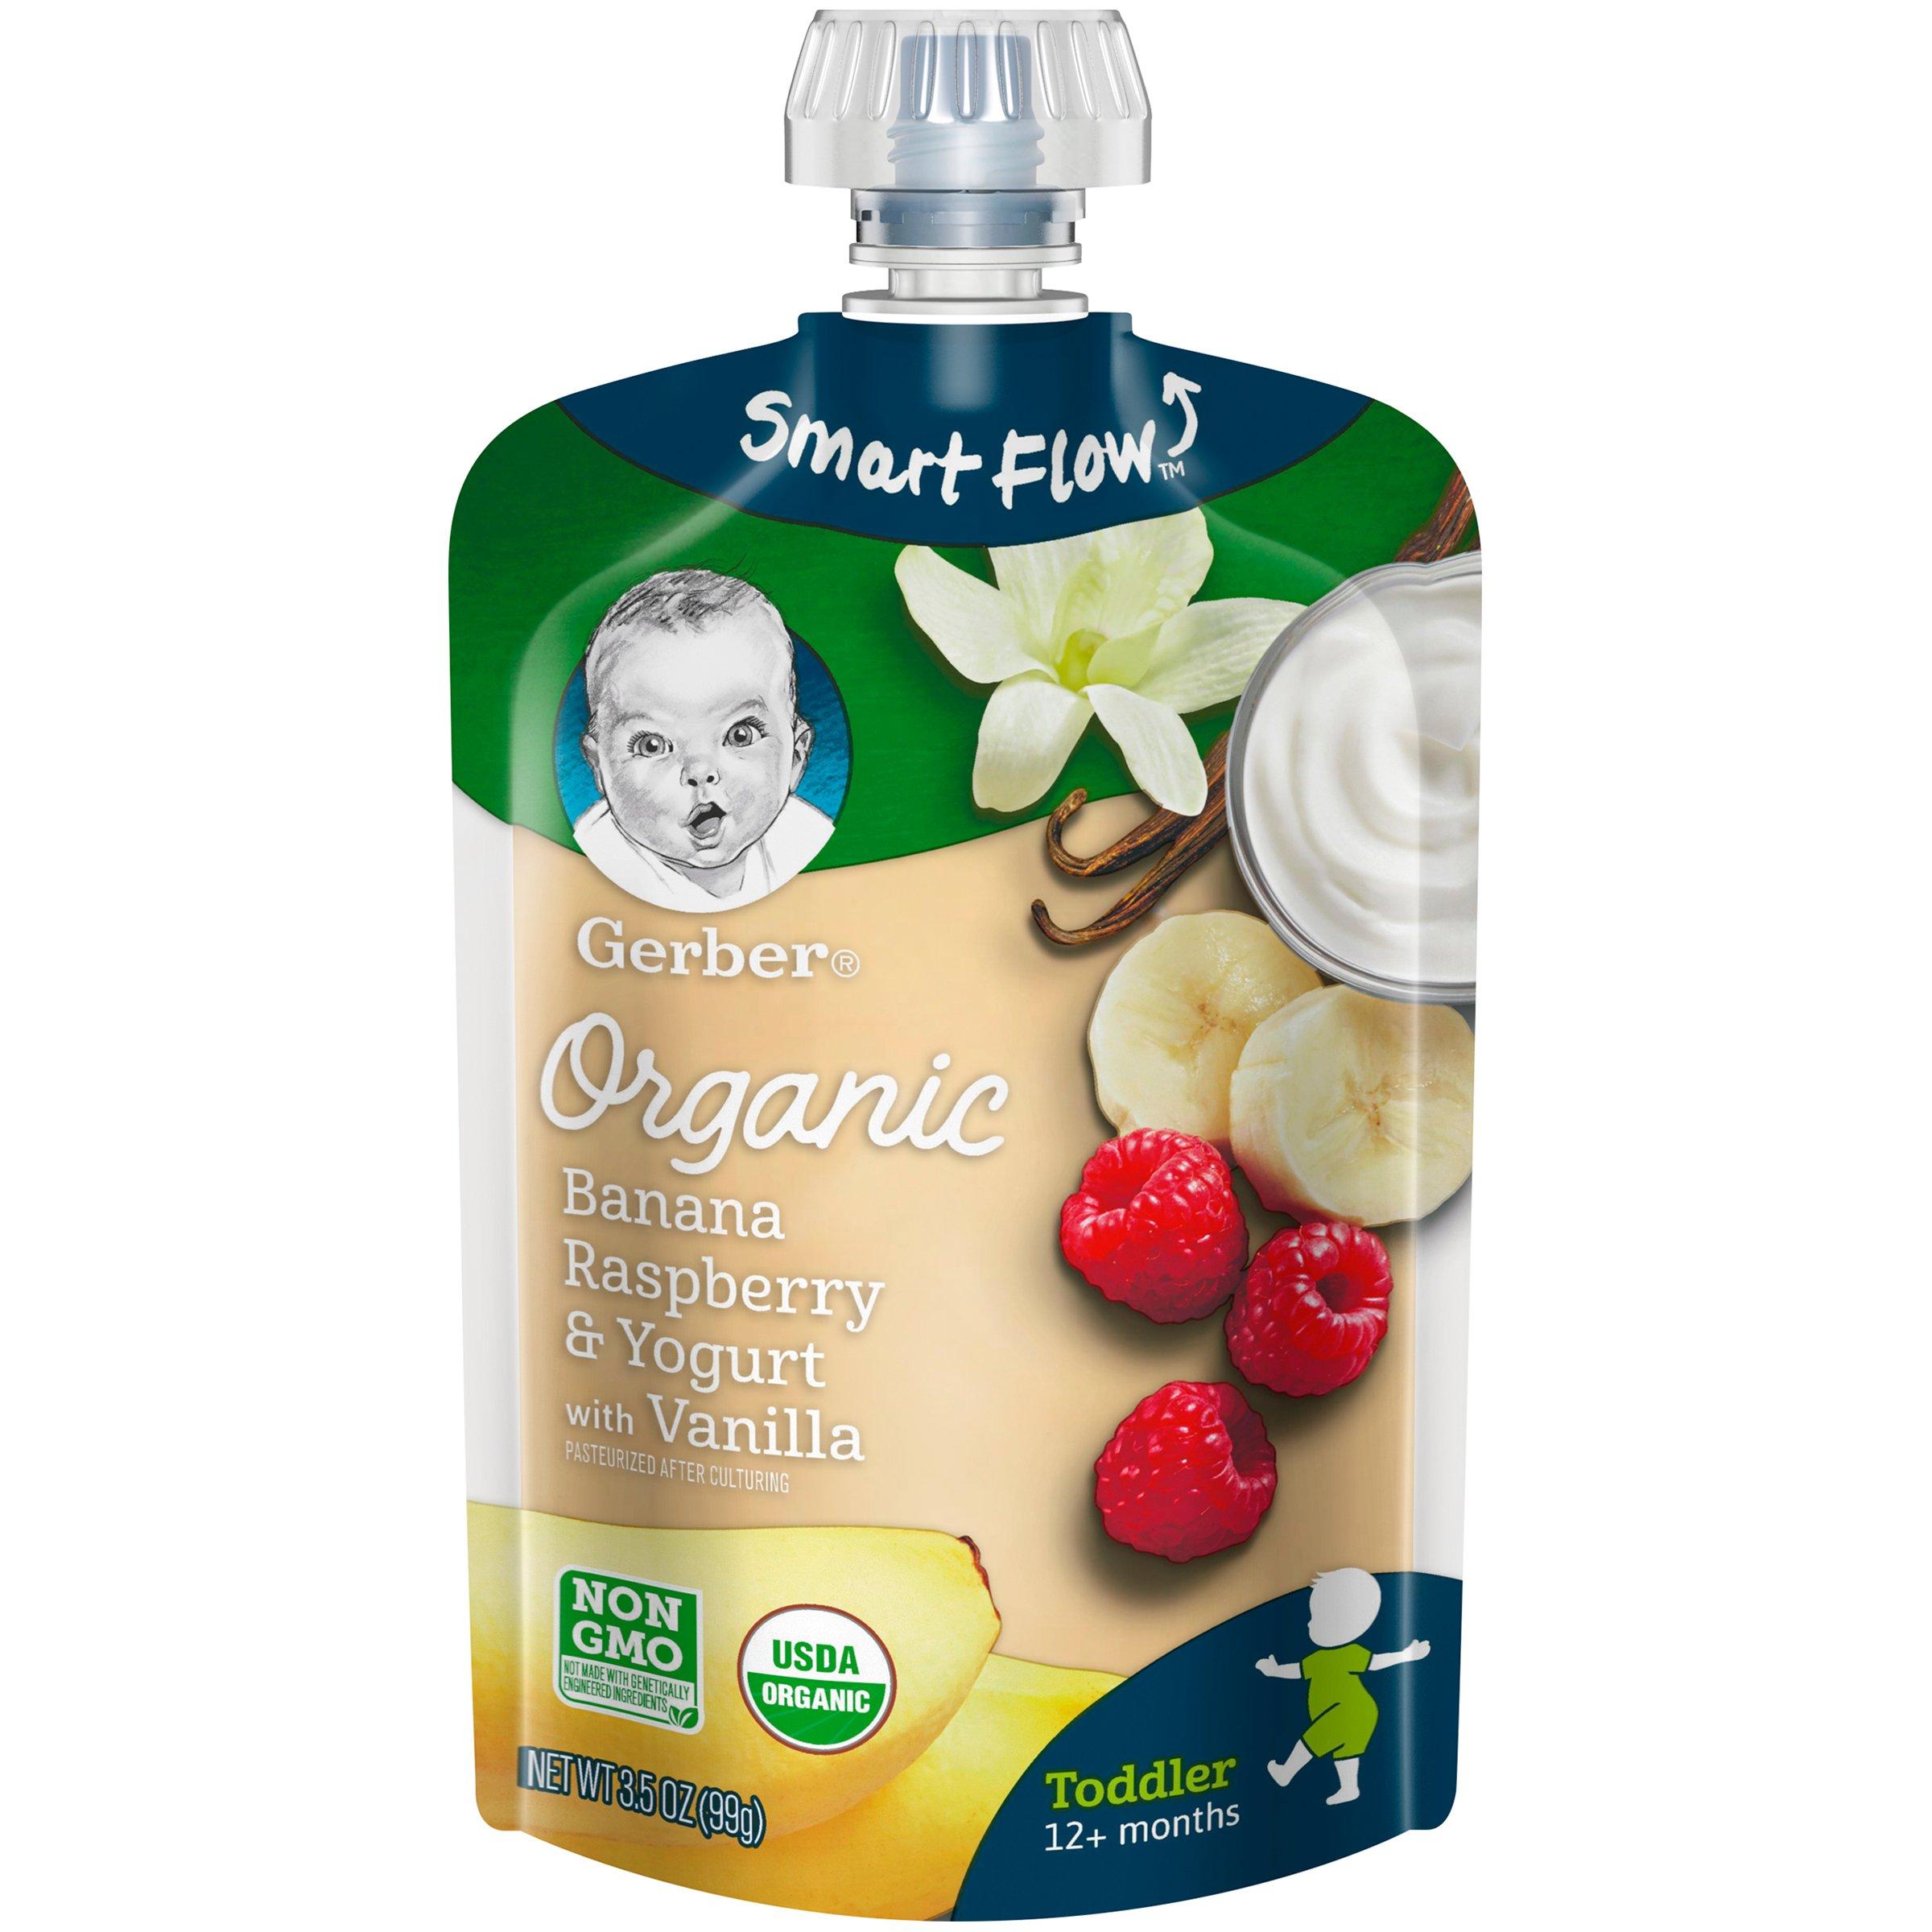 Gerber Purees Organic Banana Raspberry Yogurt Vanilla Toddler Pouch, 3.5 Ounces (Pack of 12) by GERBER